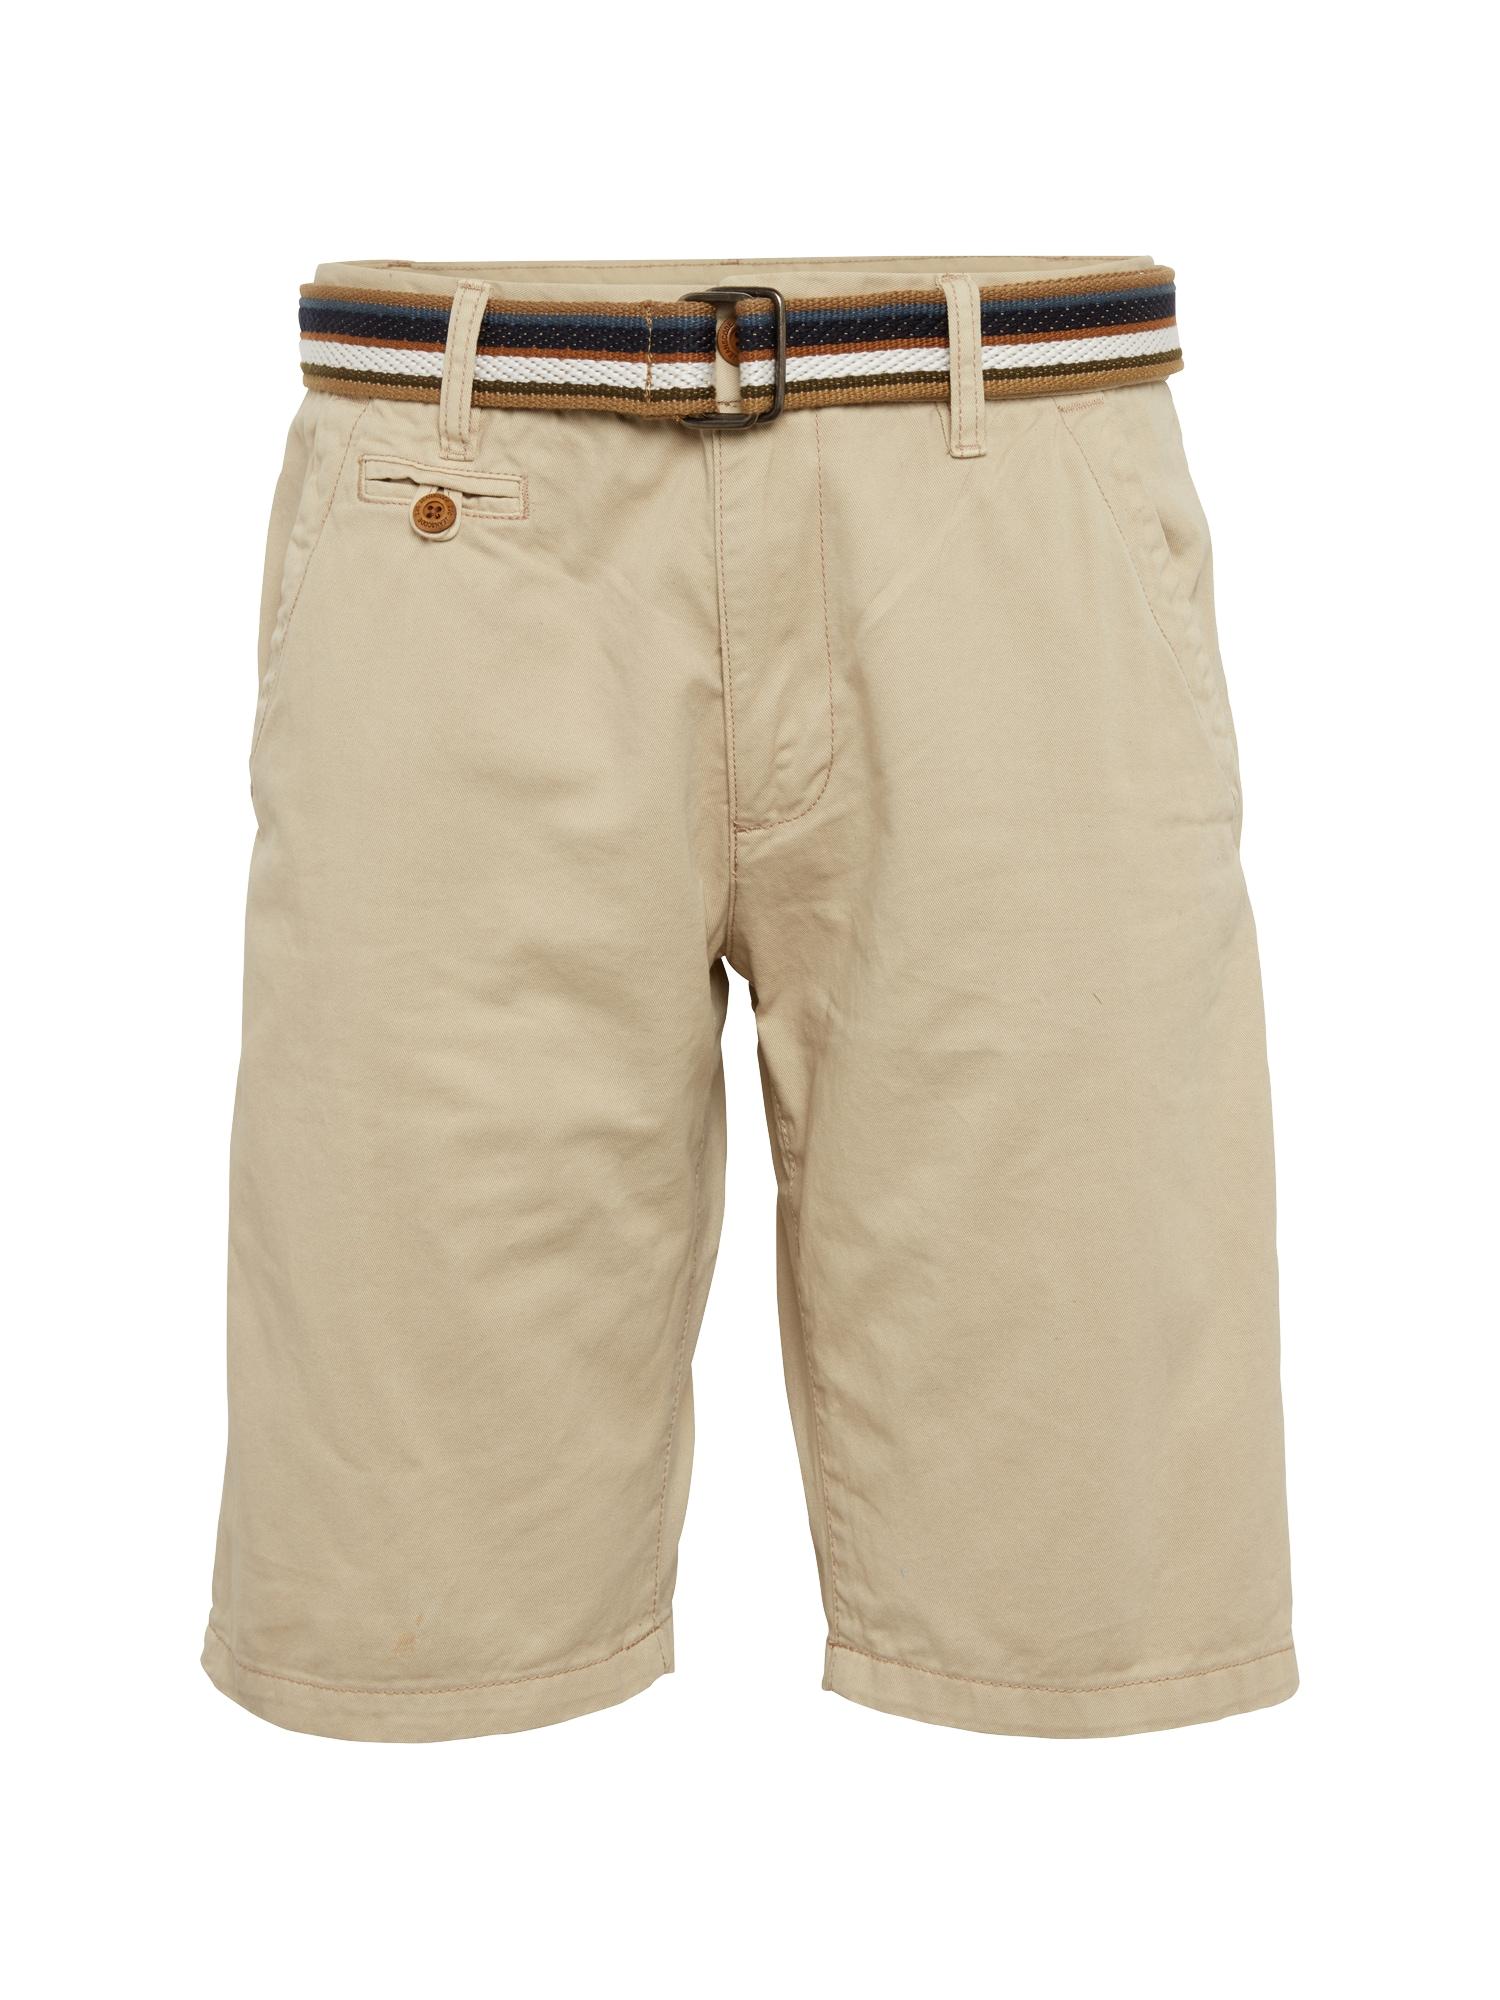 INDICODE JEANS Chino stiliaus kelnės 'Royce' gelsvai pilka spalva